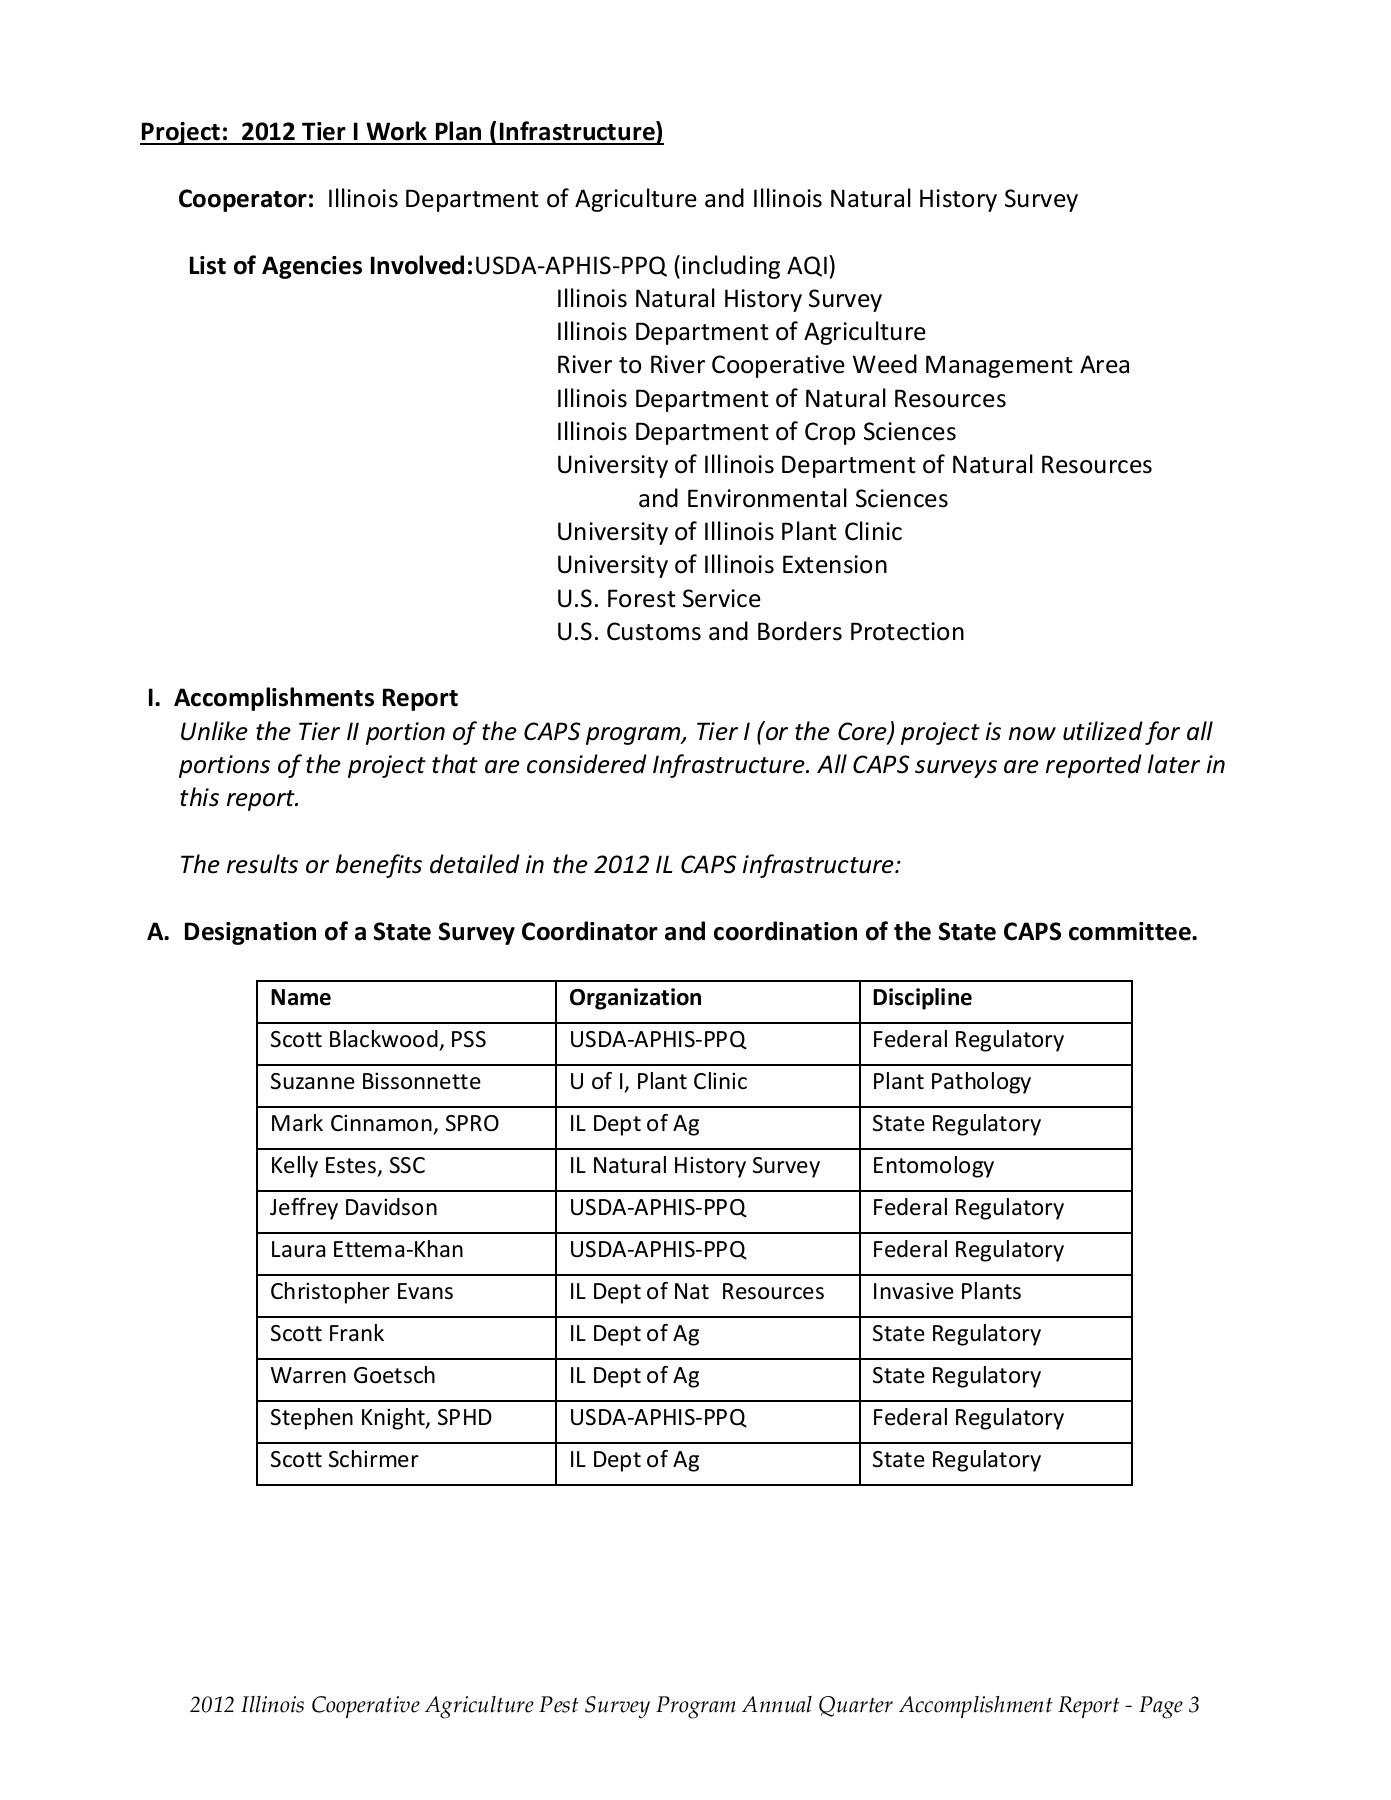 Accomplishment Report Format - Illinois Natural History Survy